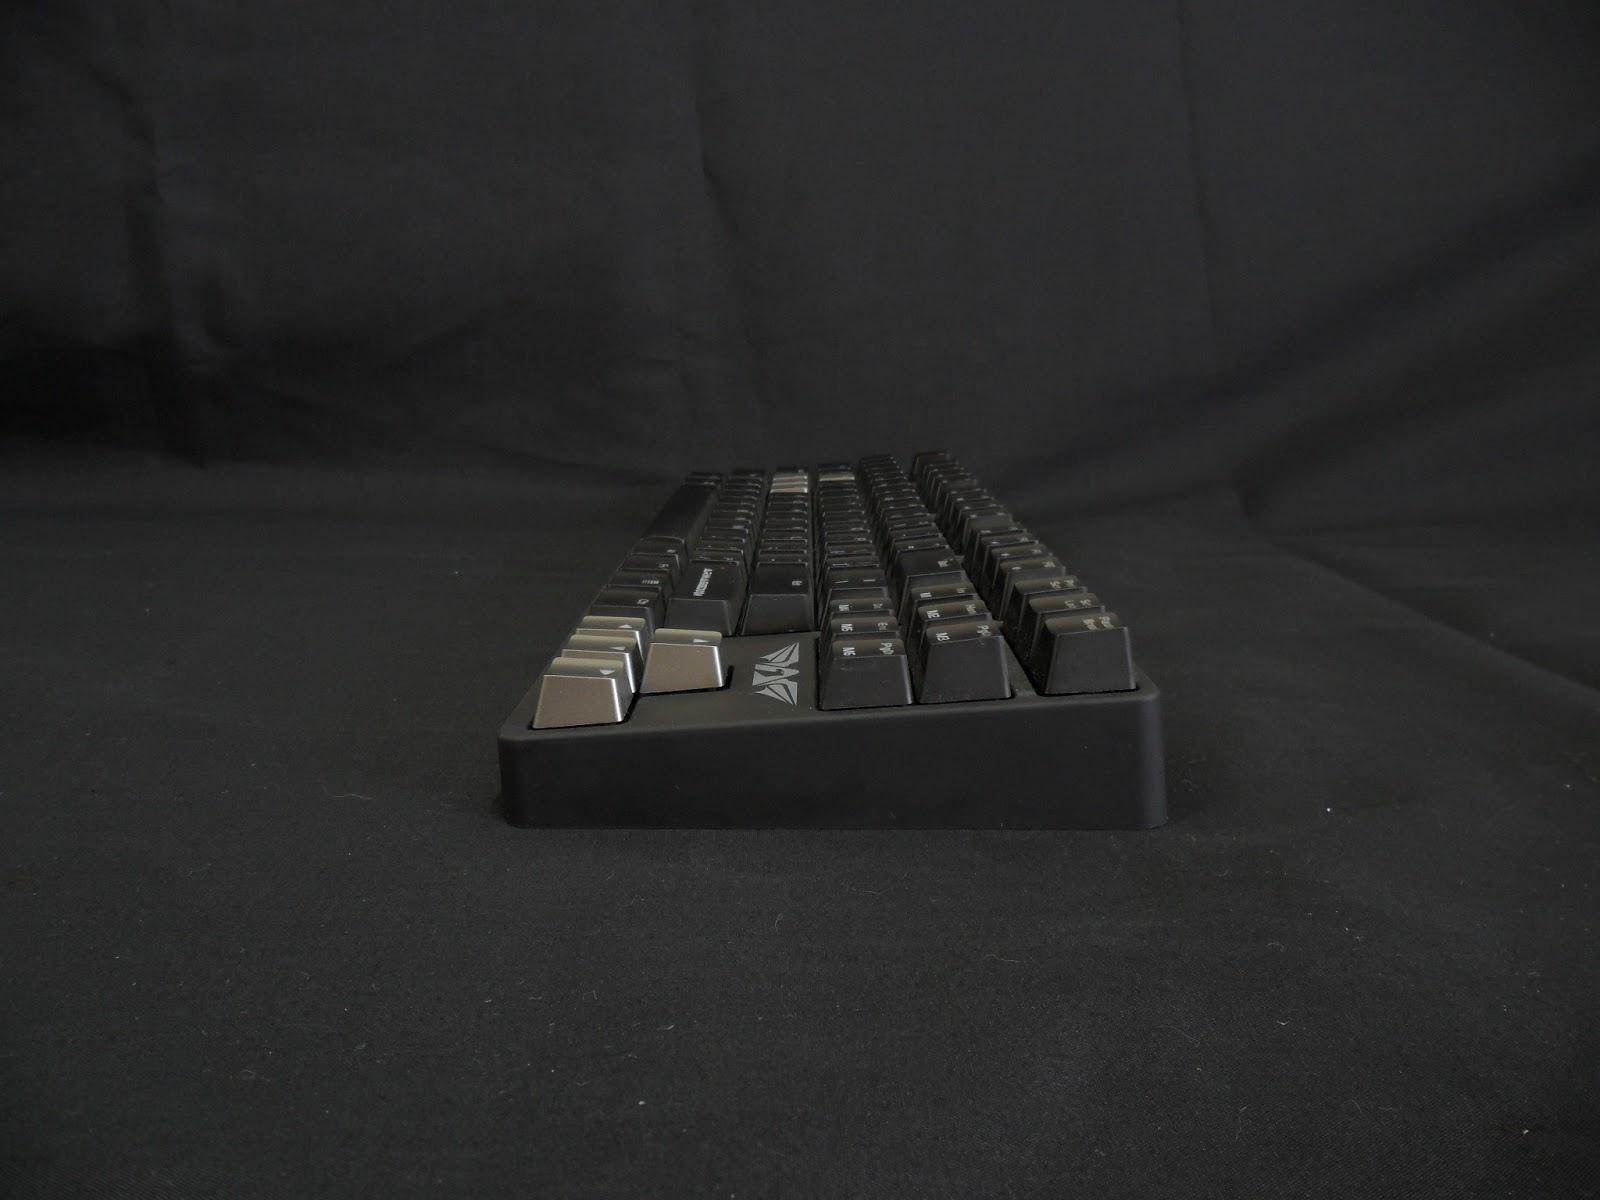 Unboxing & Review: Armaggeddon Black Hornet MKA-3 Mechanical Gaming Keyboard 9